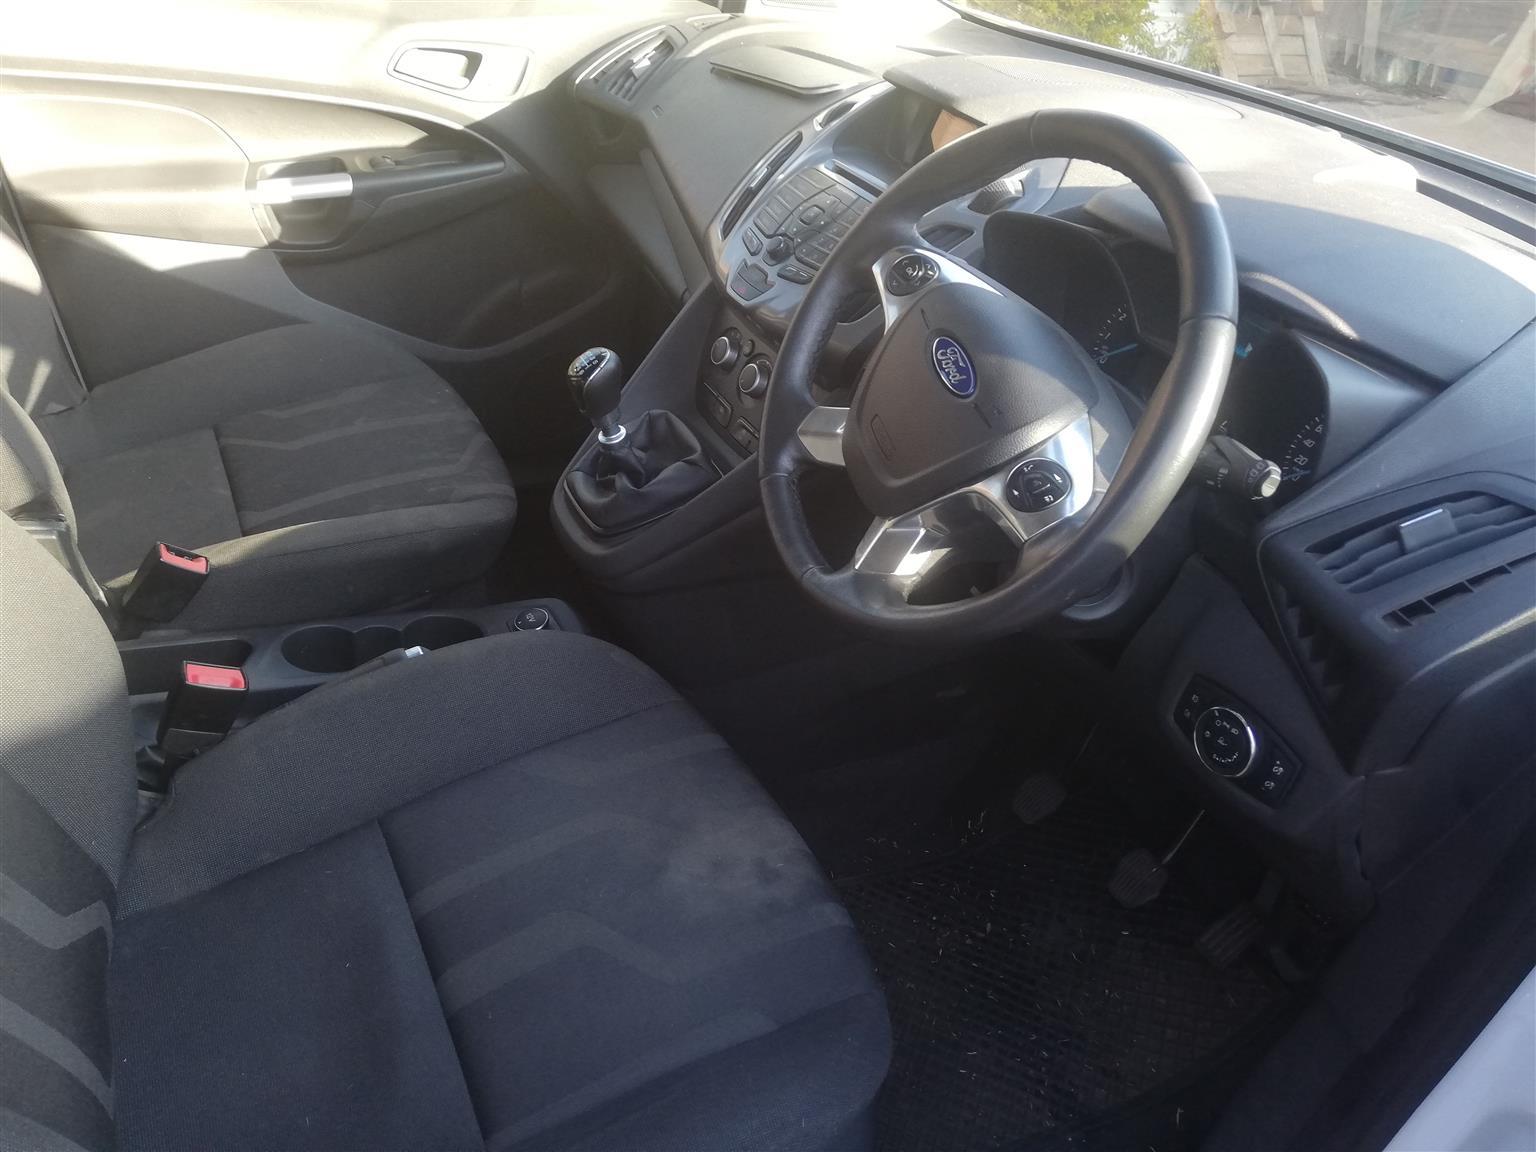 2015 Ford Tourneo 2.2TDCi MWB 12 seat